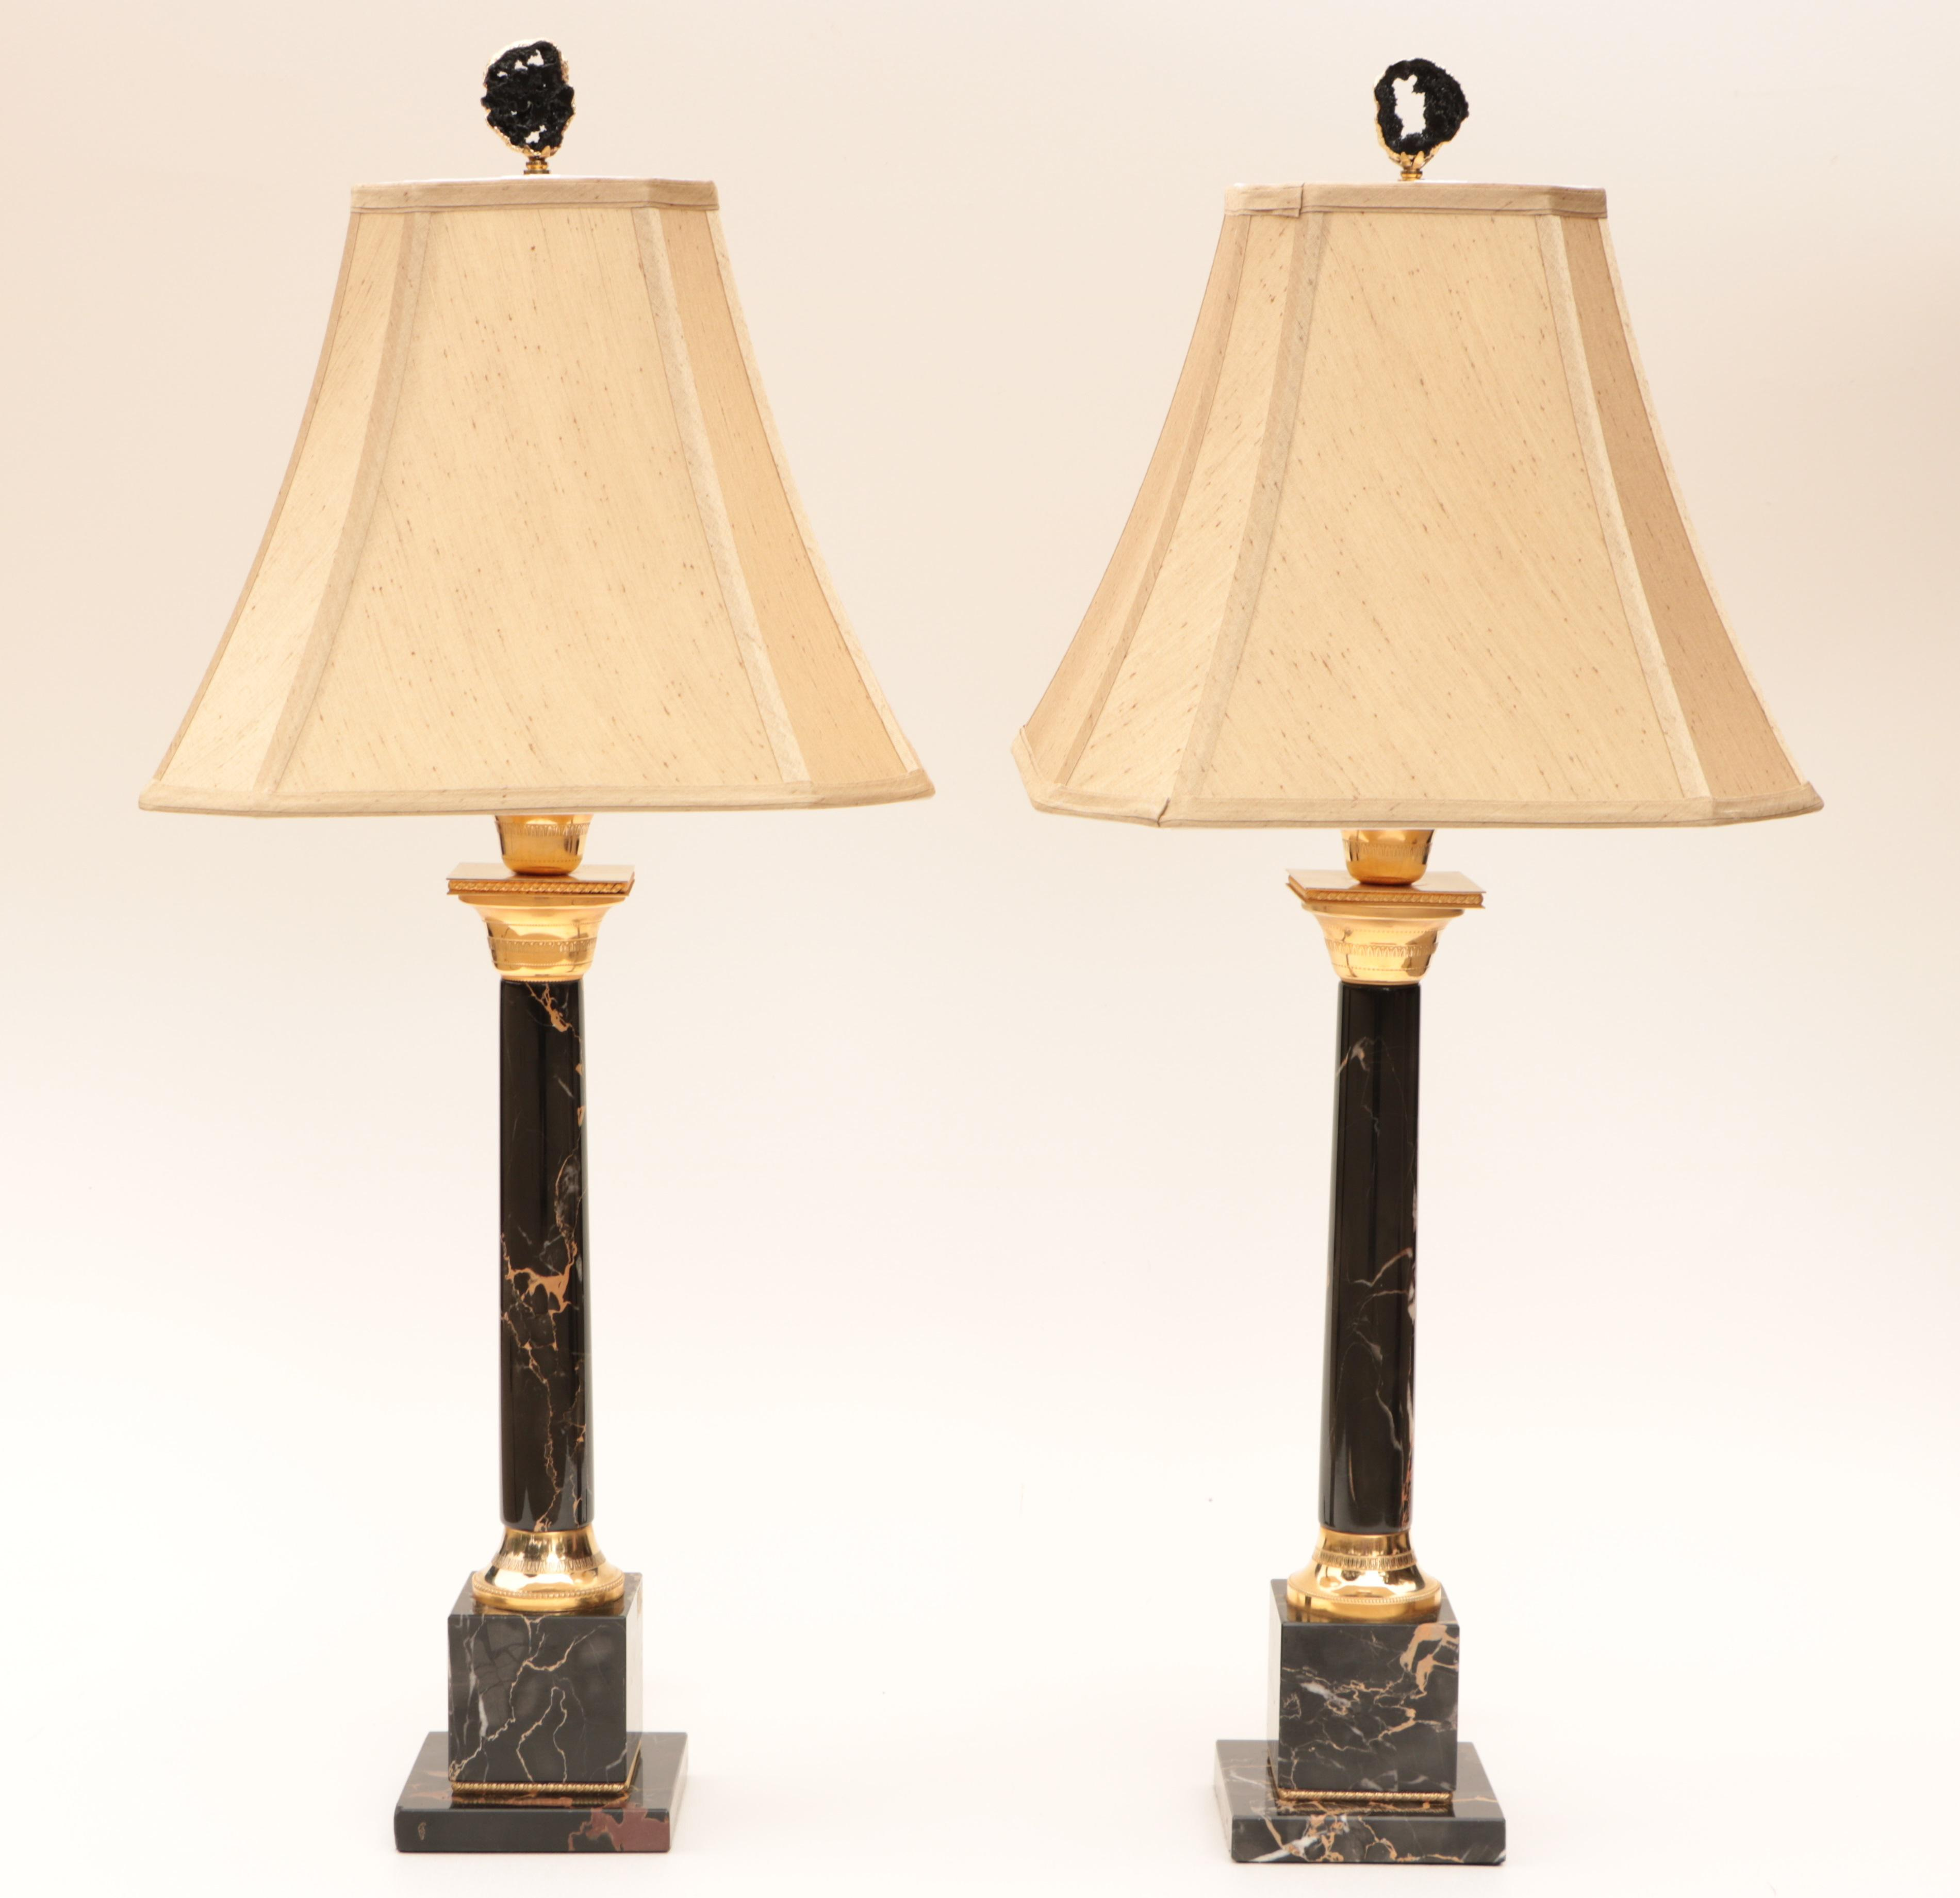 Portoro Black Marble Table Lamps A Pair Chairish